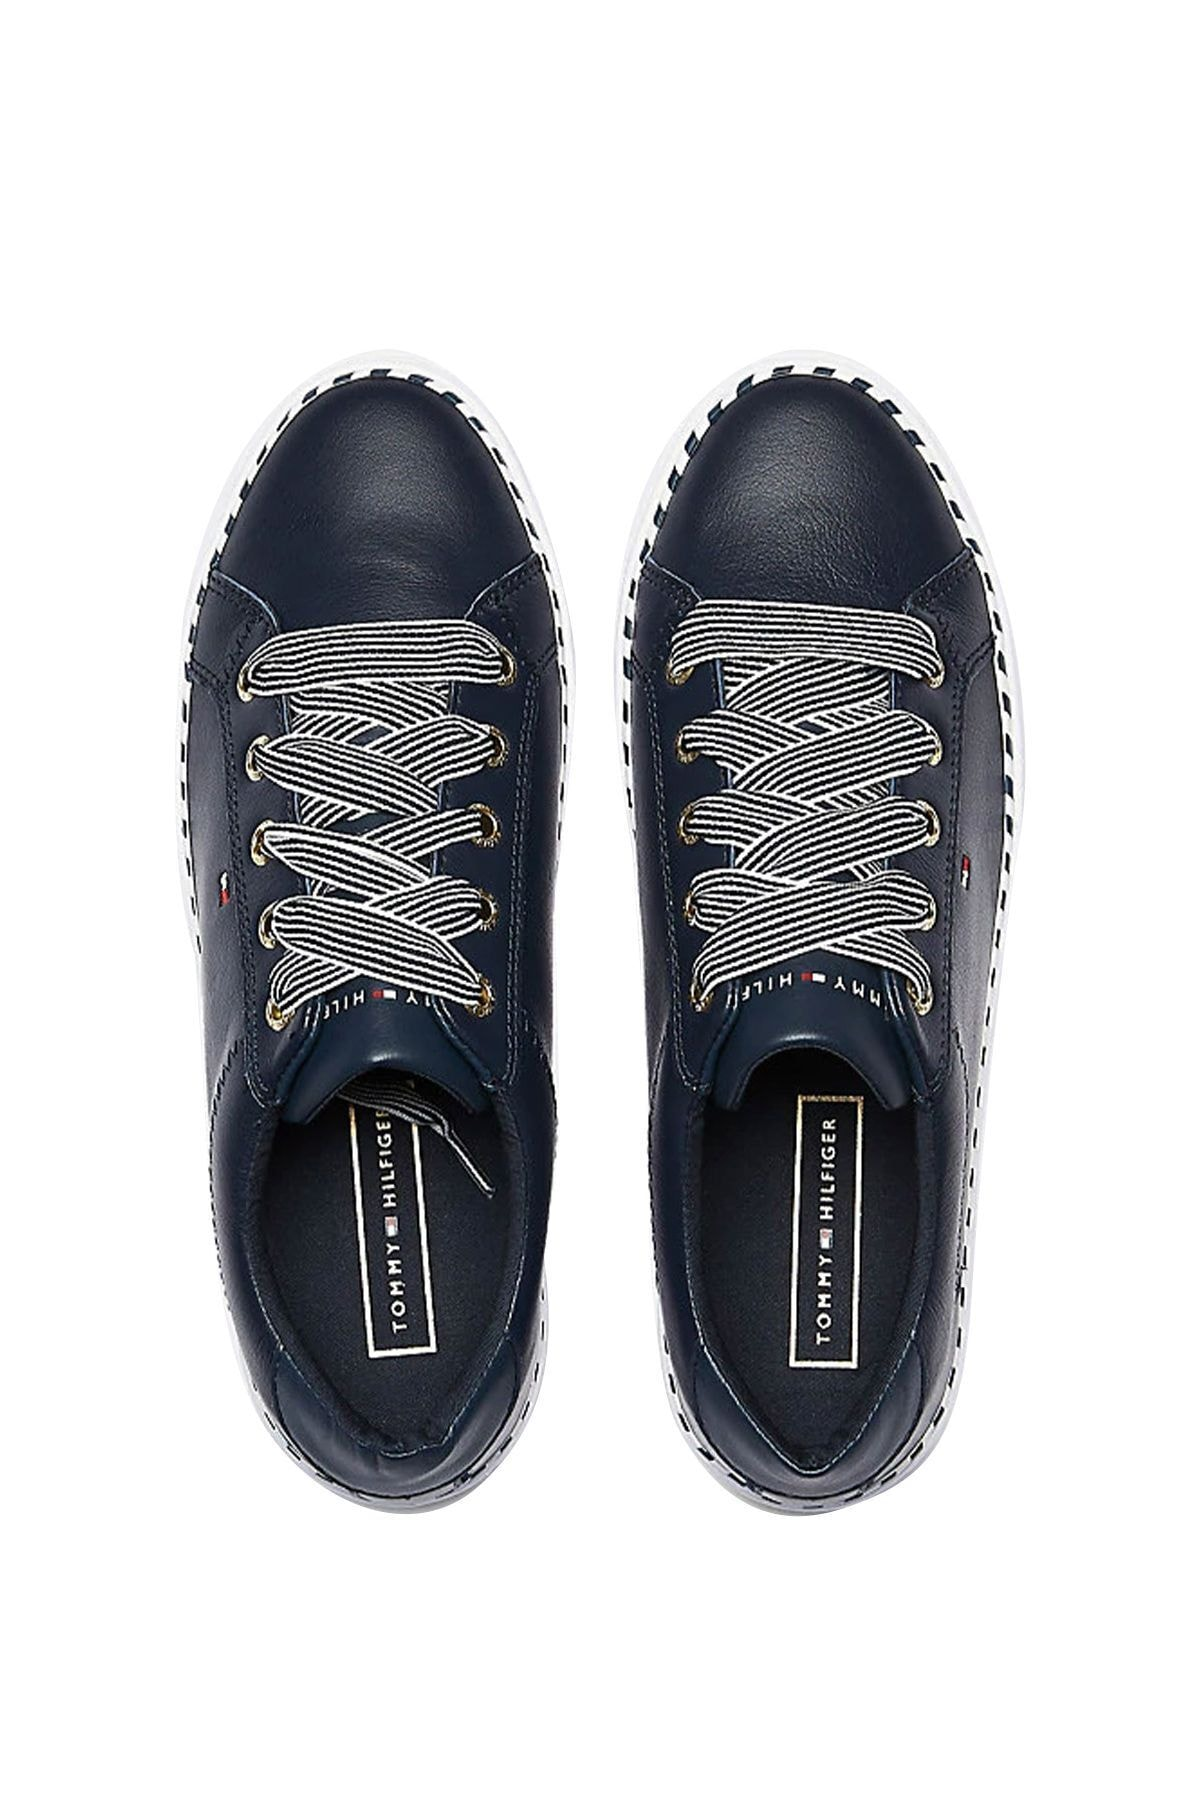 Tommy Hilfiger Kadın Nautical Lace Up Sneaker Fw0fw04689 2